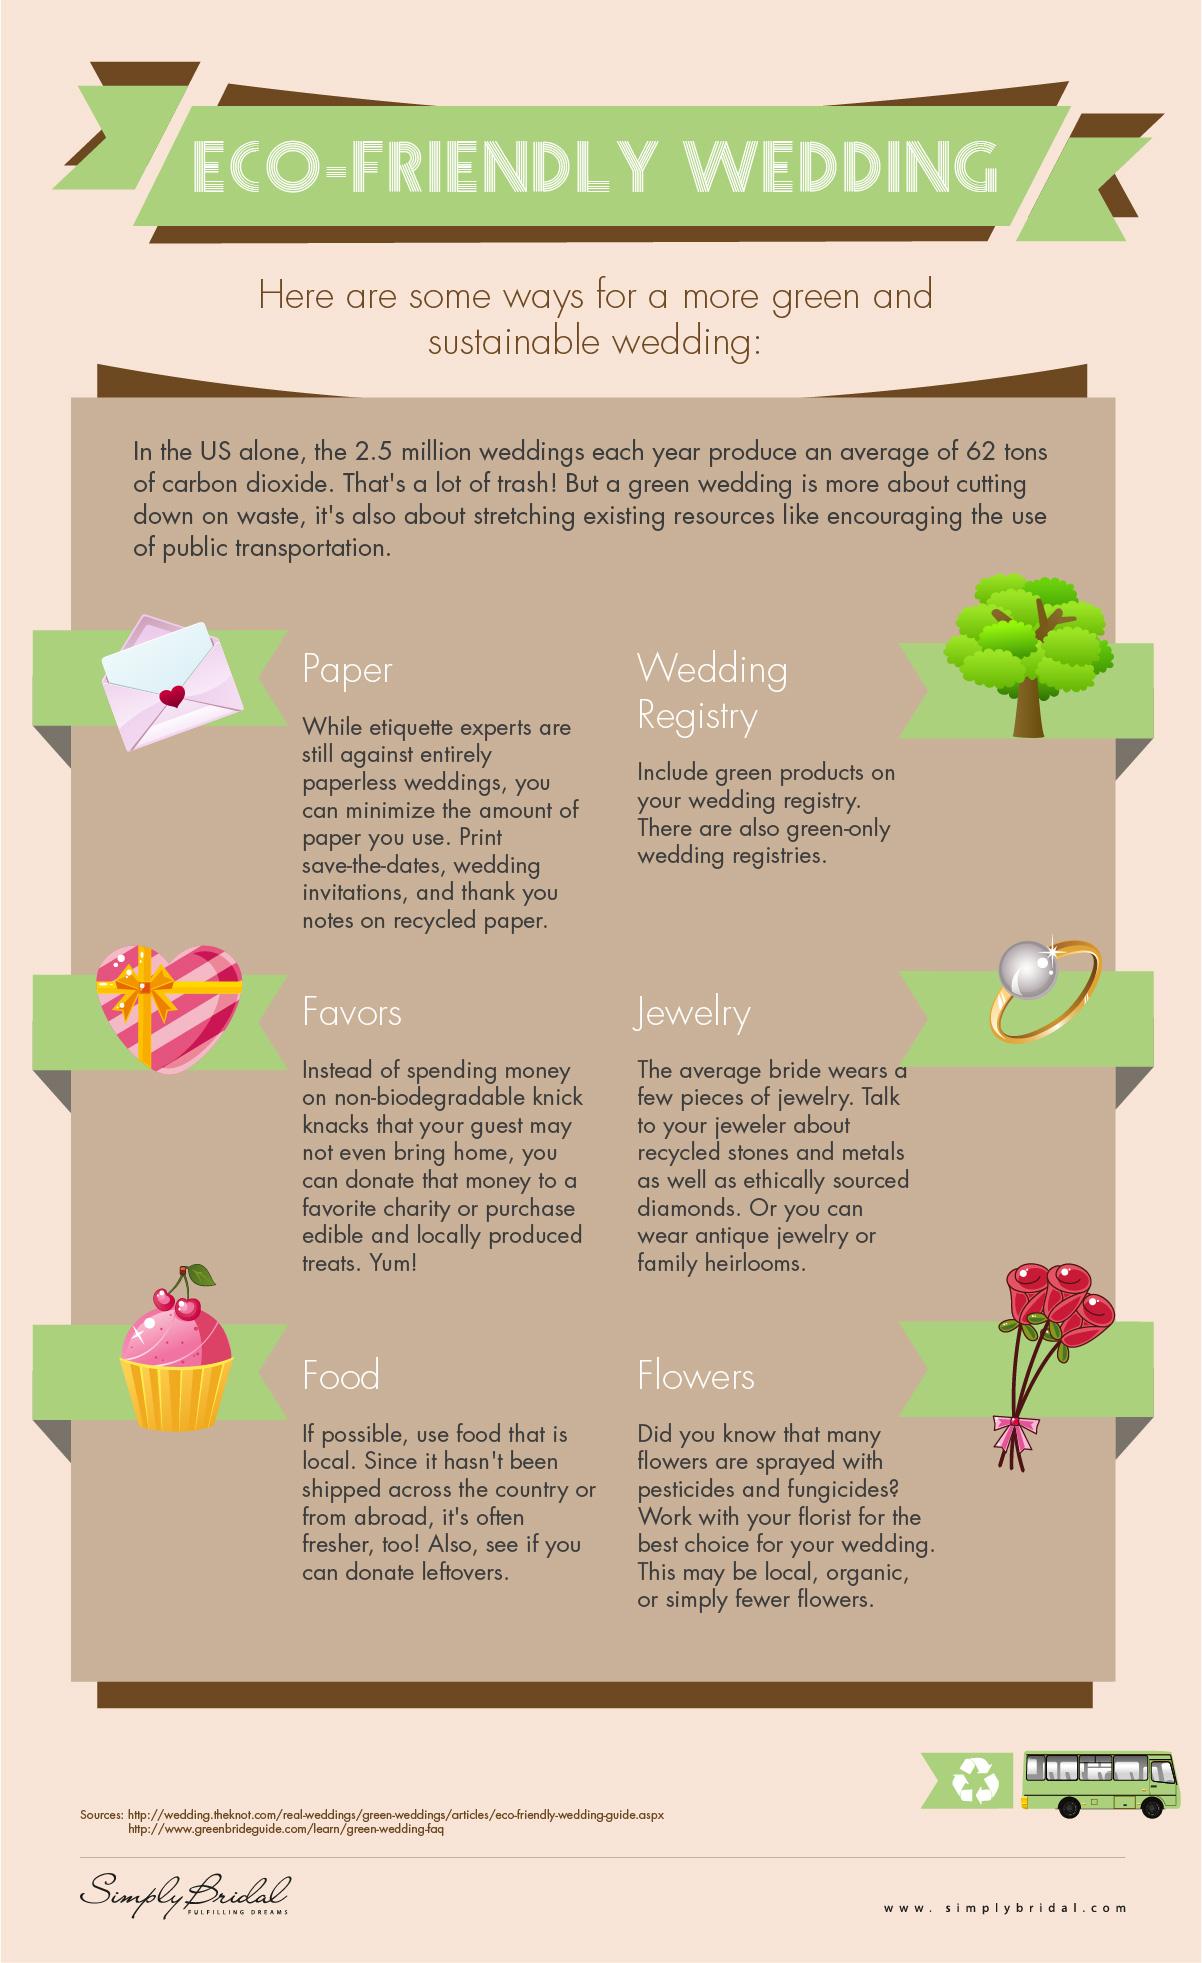 SimplyBridal Eco-Friendly Wedding Infographic